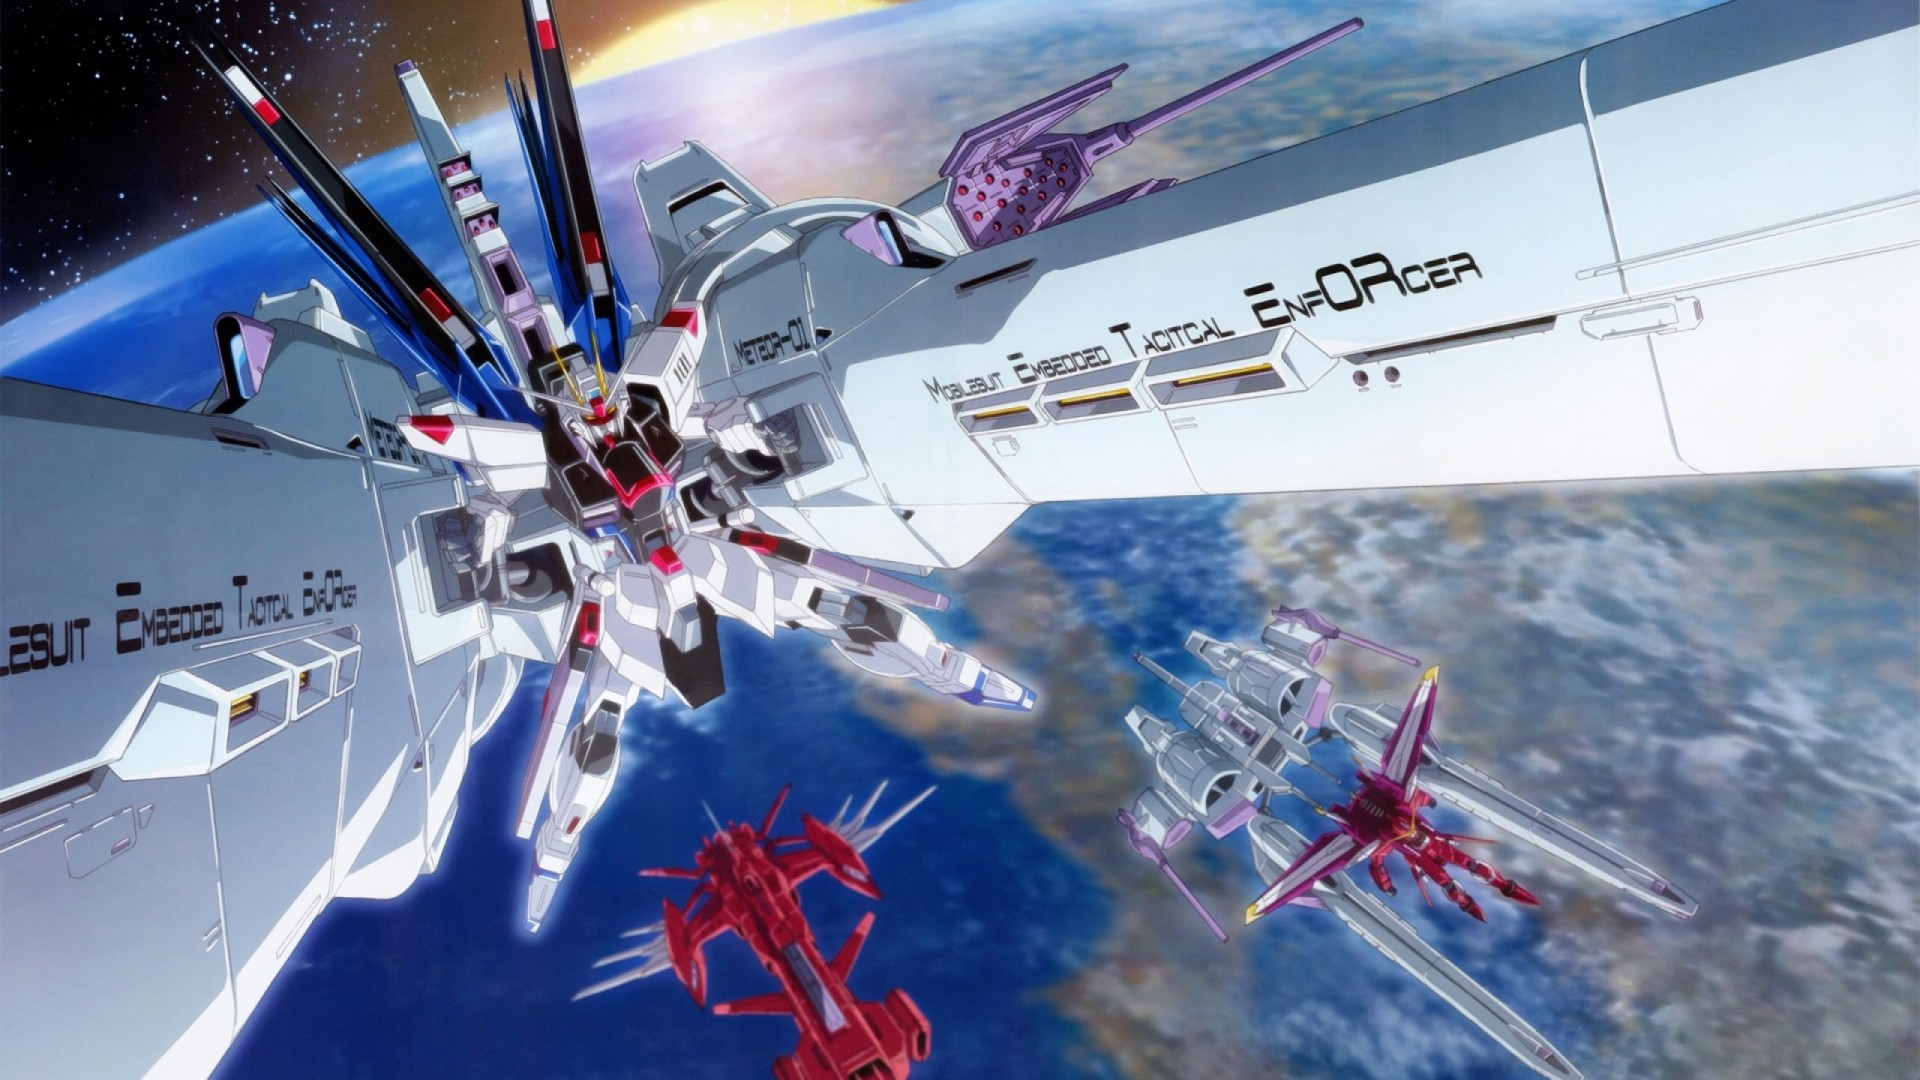 Hd Gundam Themes: Gundam Seed Theme For Windows 10